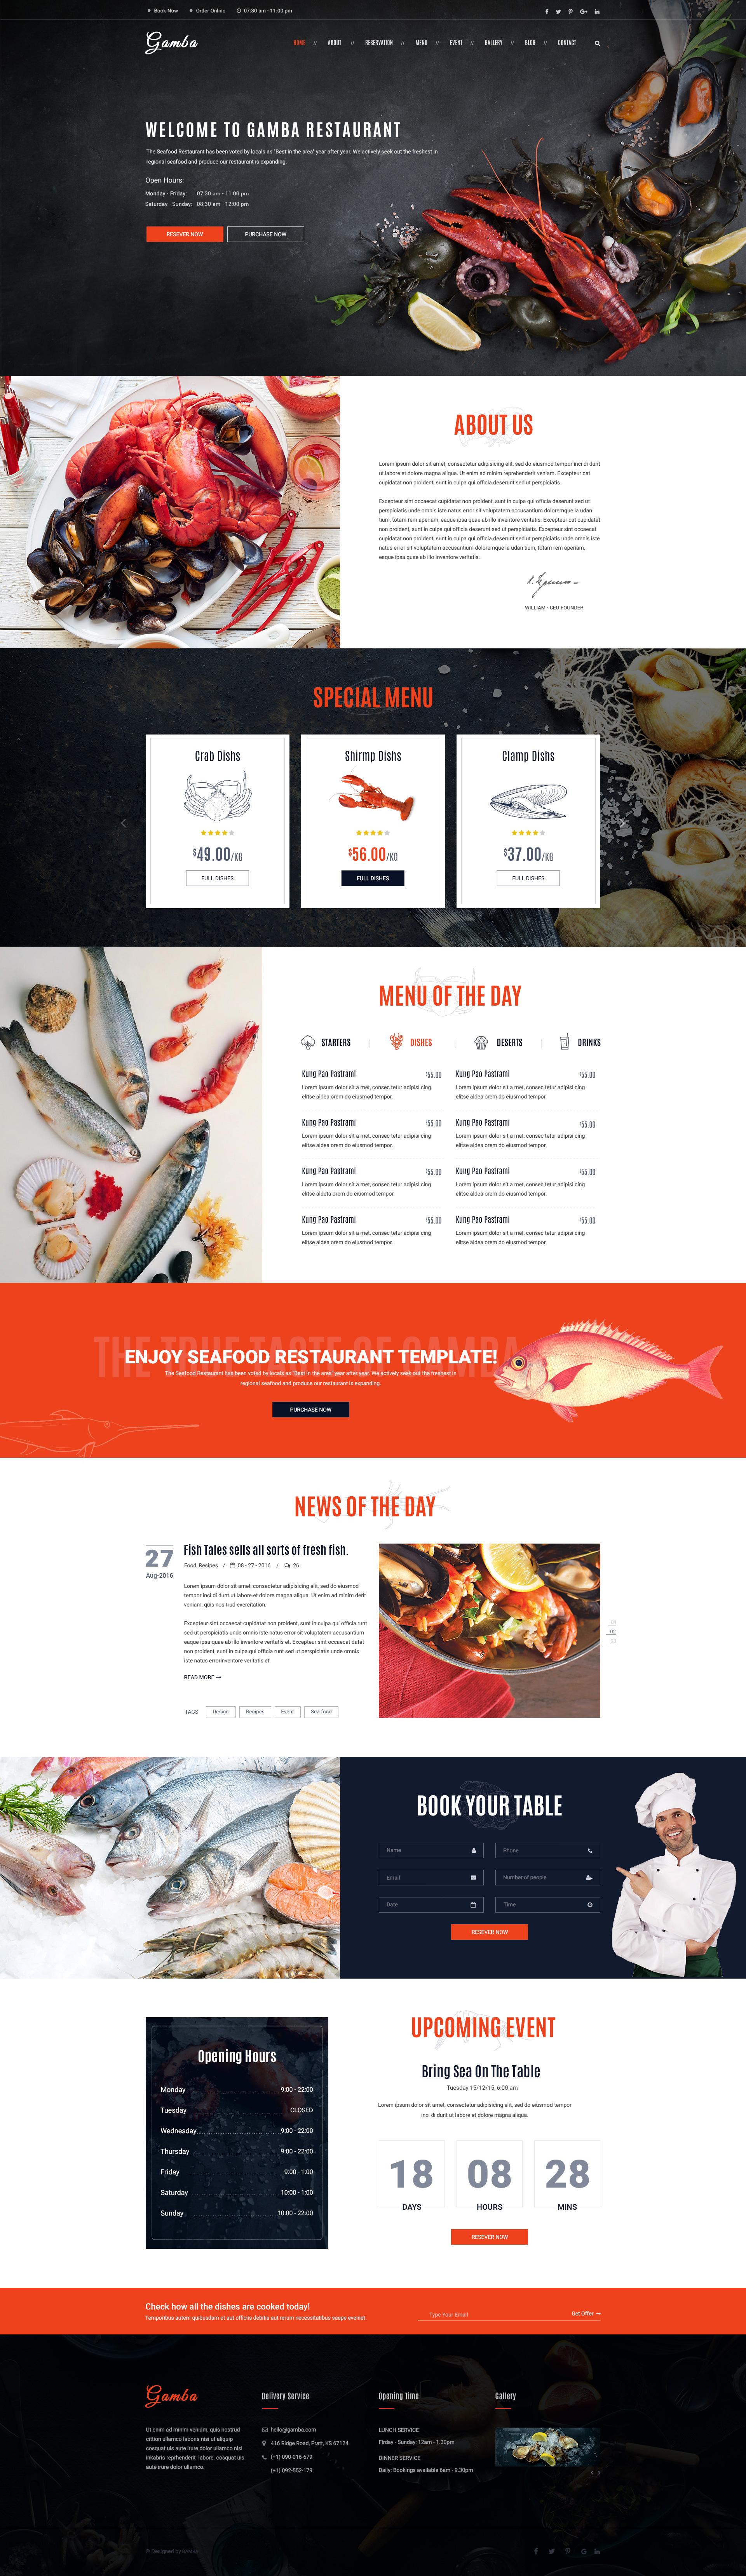 Gamba - Food & Restaurant PSD Template by GambaThemes | ThemeForest